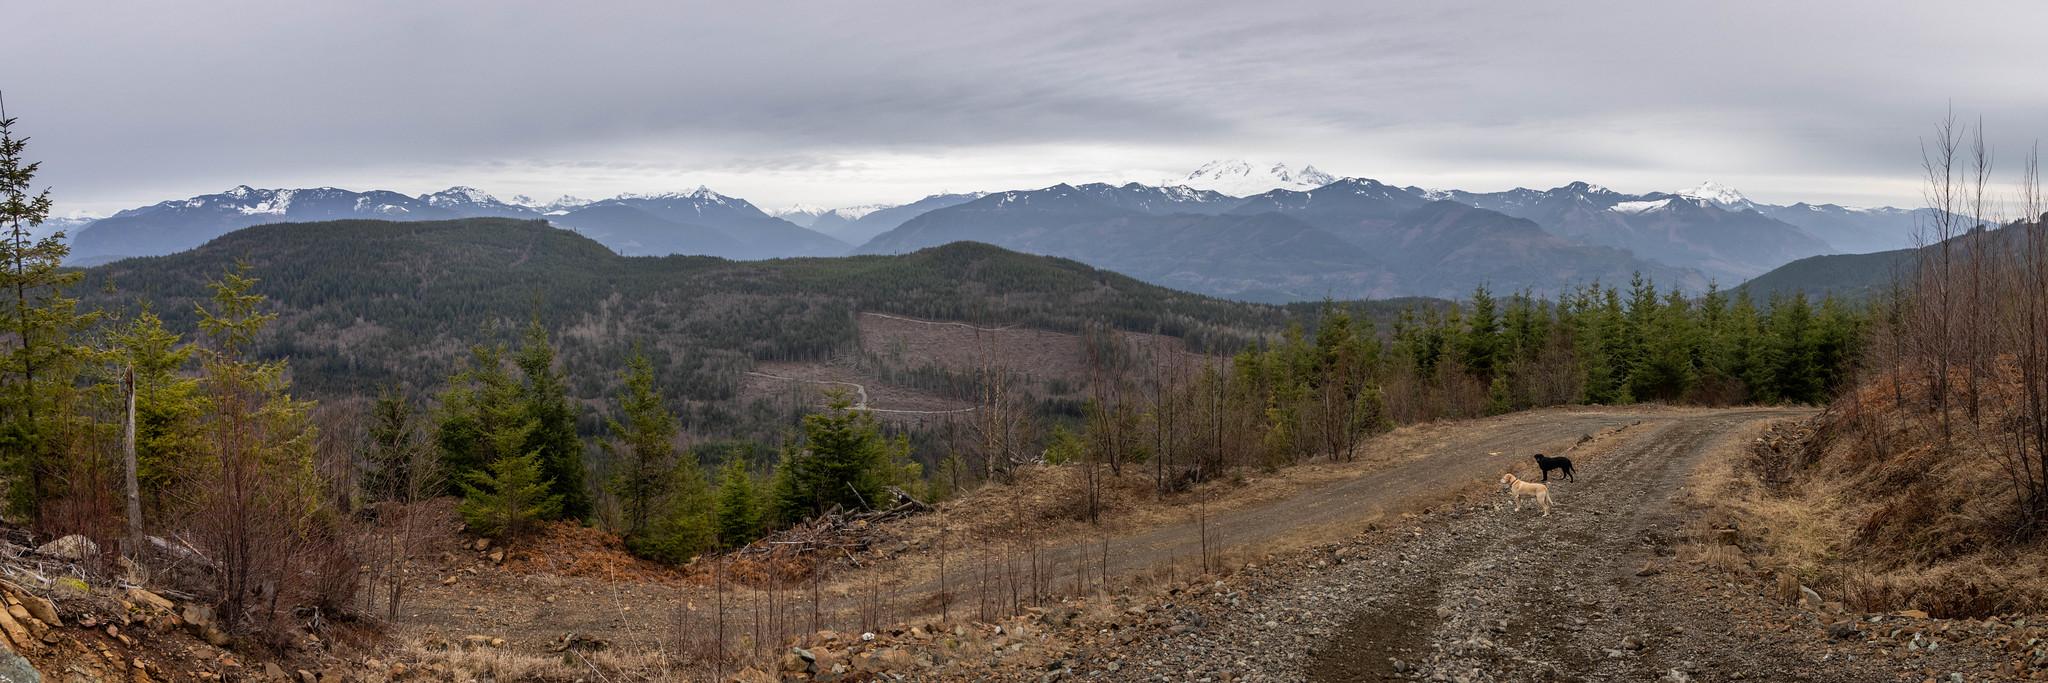 Western panoramic view below Sumas Mountain